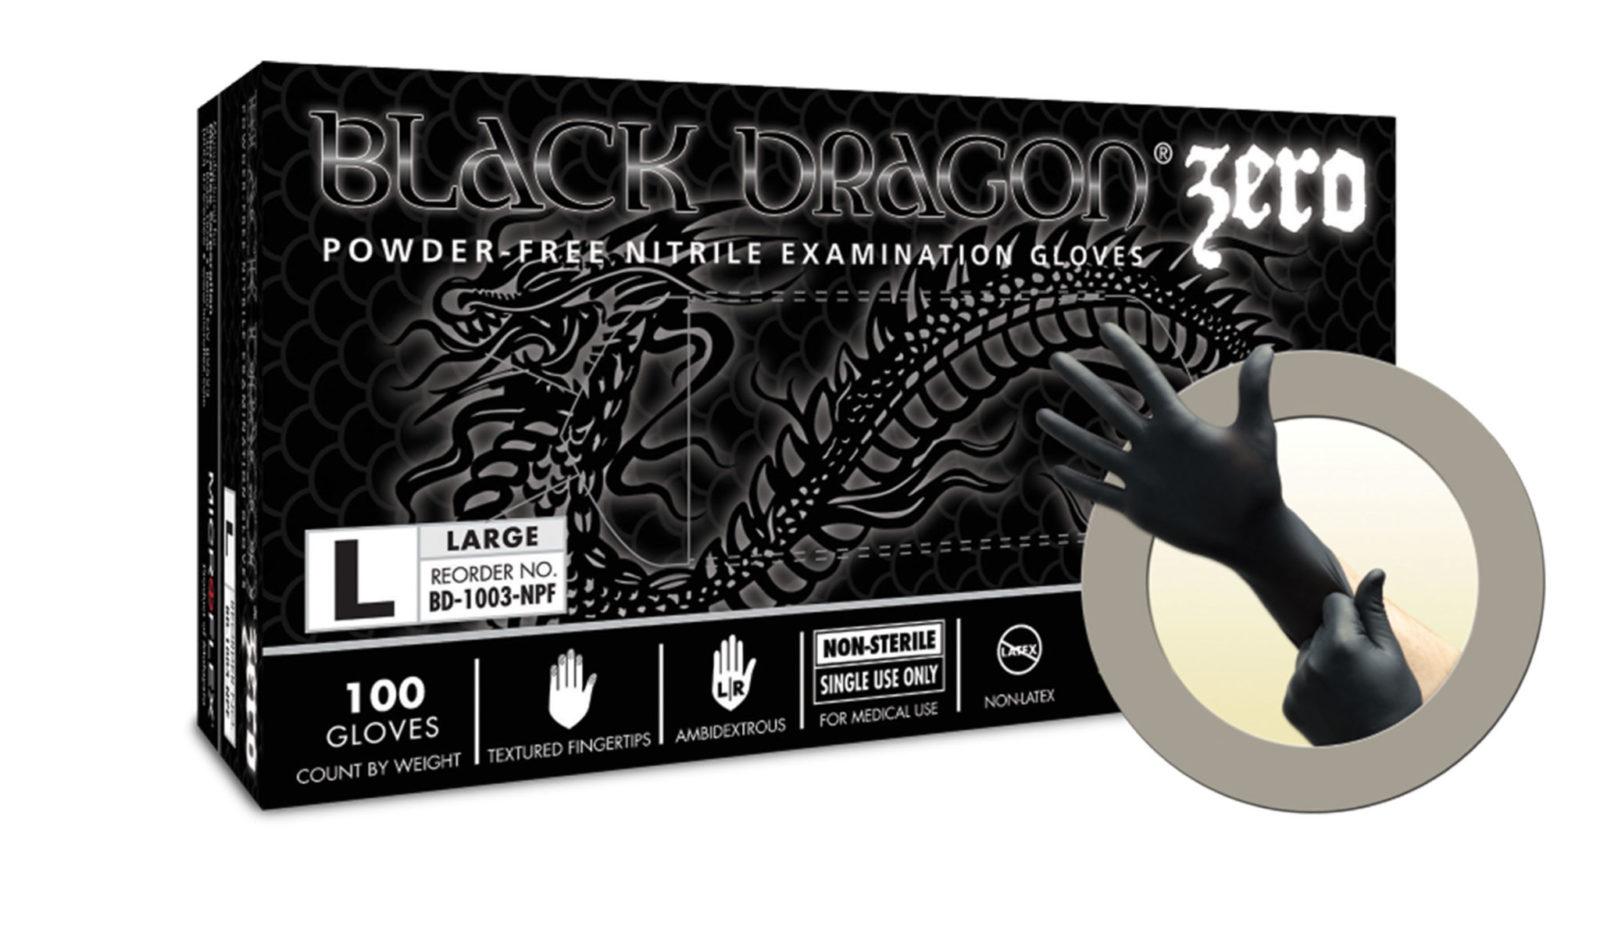 Black latex gloves xl - Microflex Black Dragon Zero Nitrile Gloves